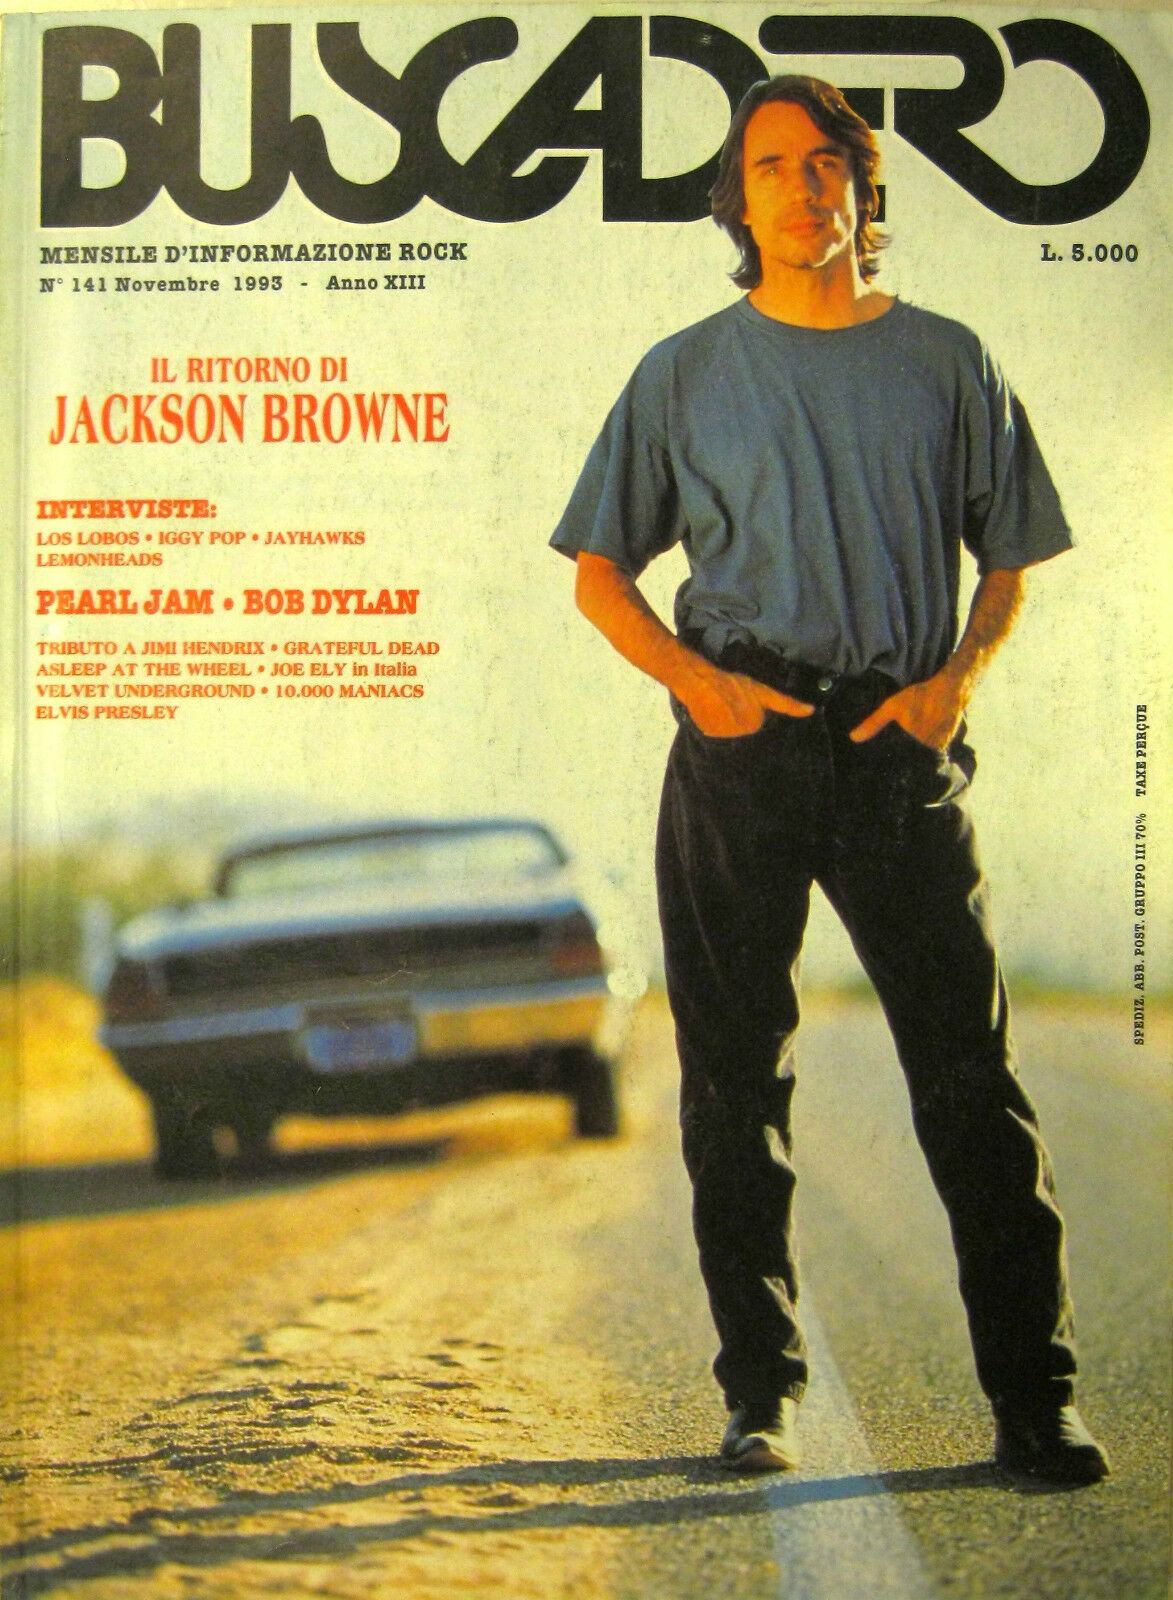 Buscadero n. 141 (novembre 1993)